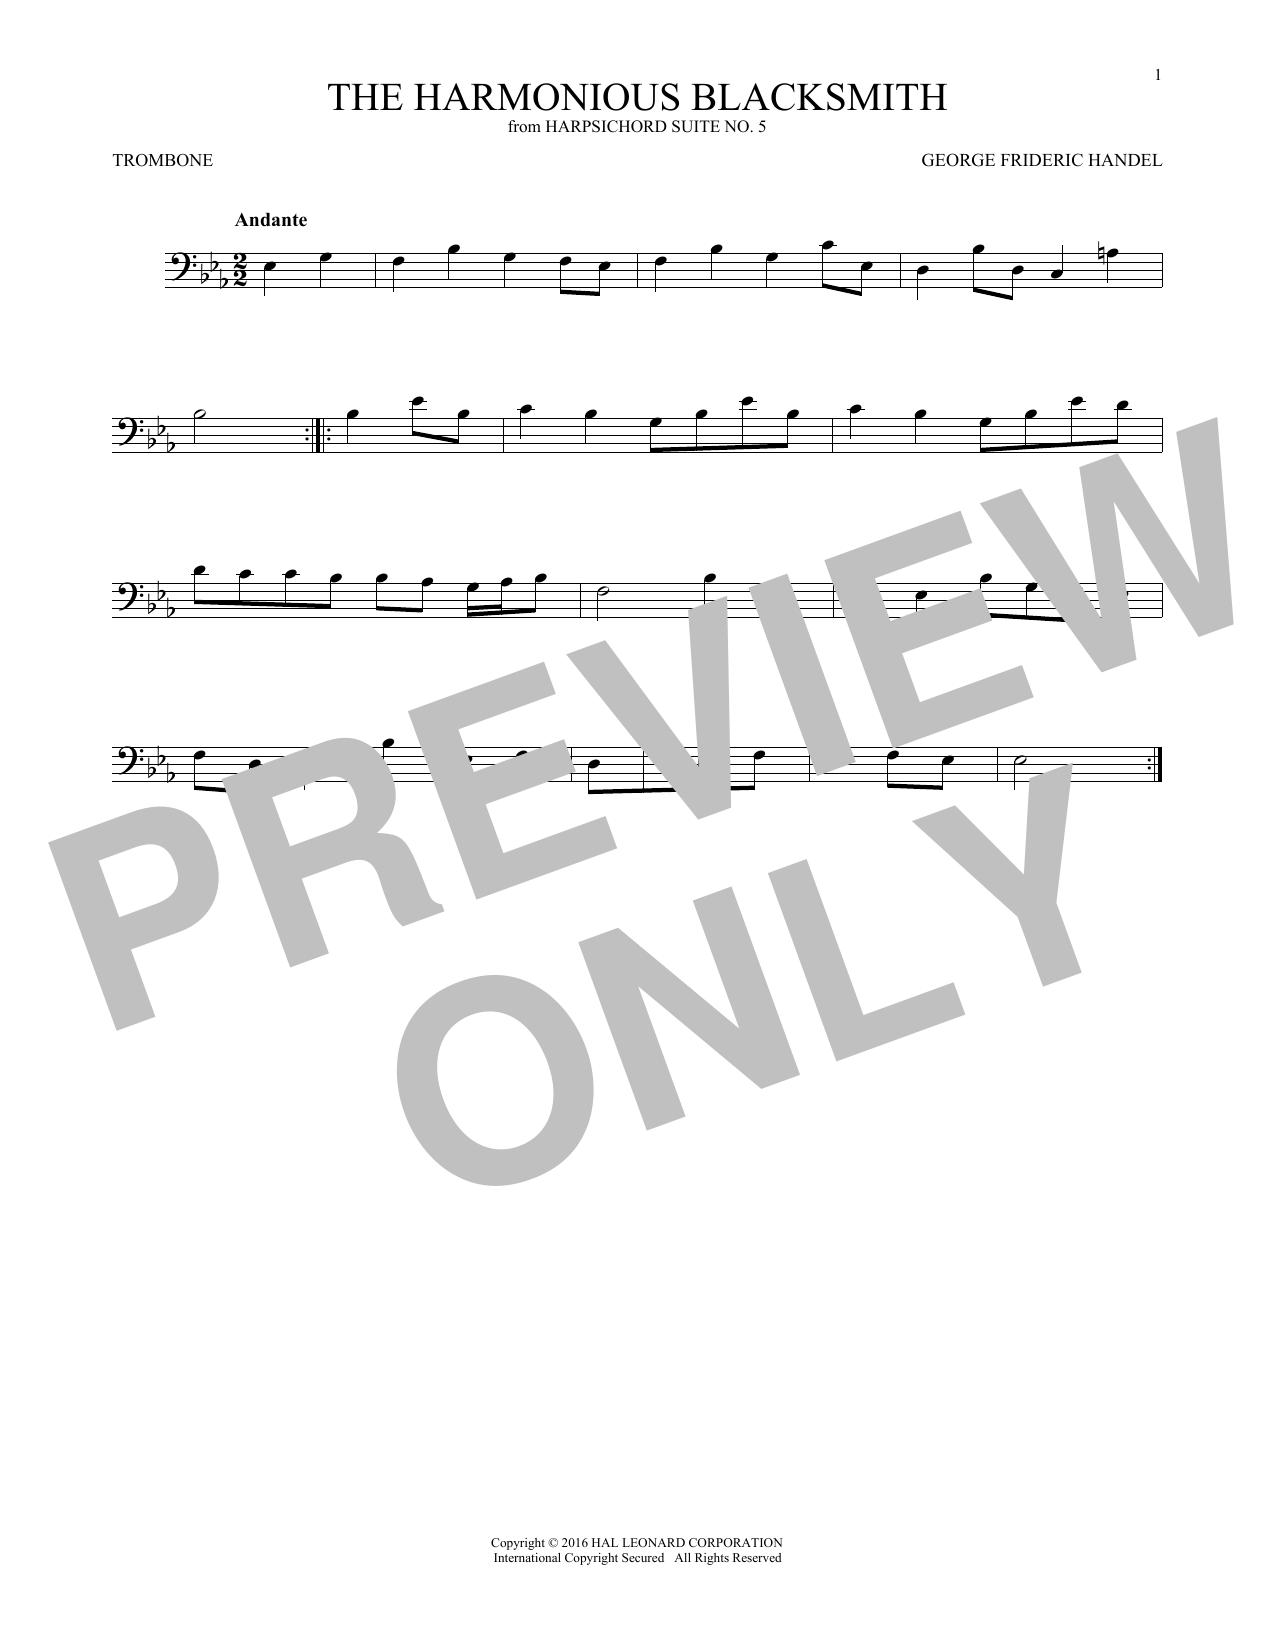 Harmonious Blacksmith (Trombone Solo)